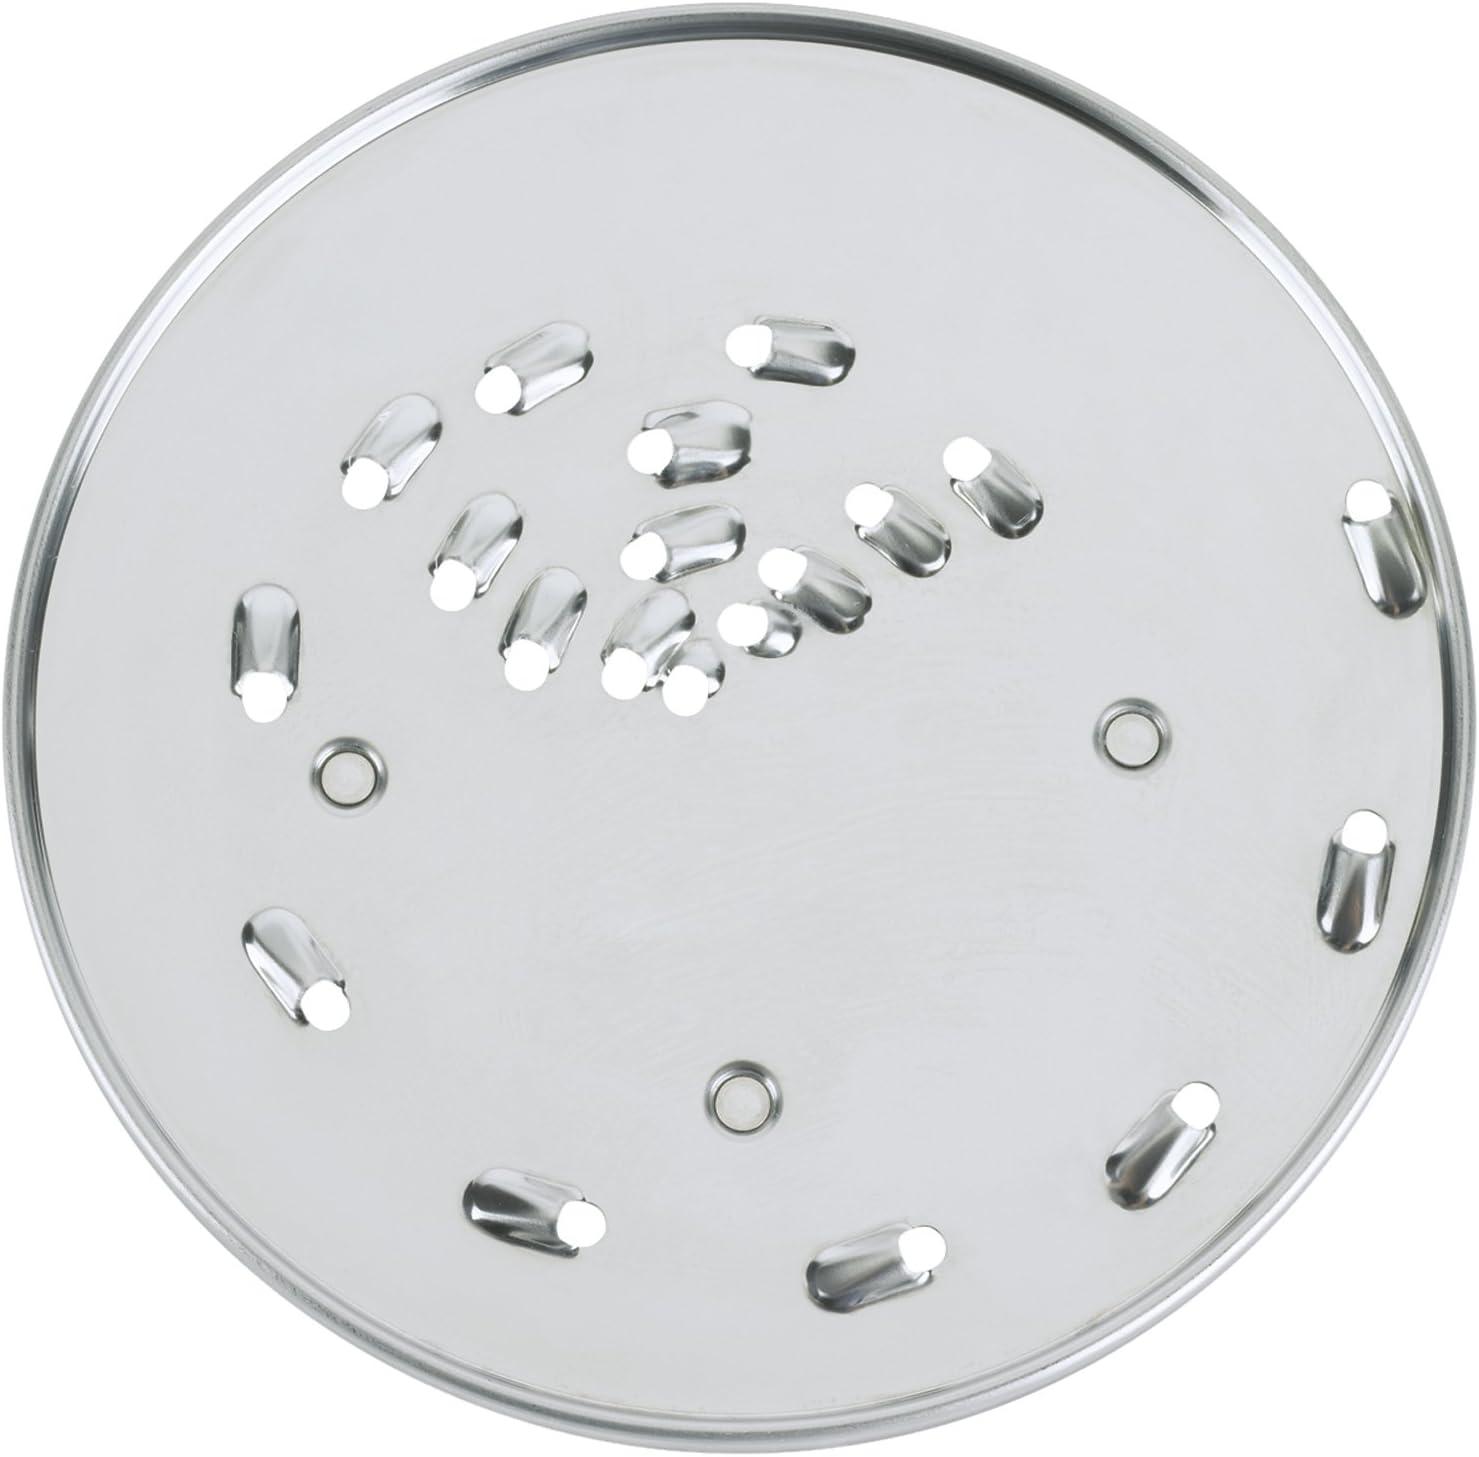 Waring Commercial WFP115 5/32-Inch Food Processor Shredding Disc, Medium,Silver